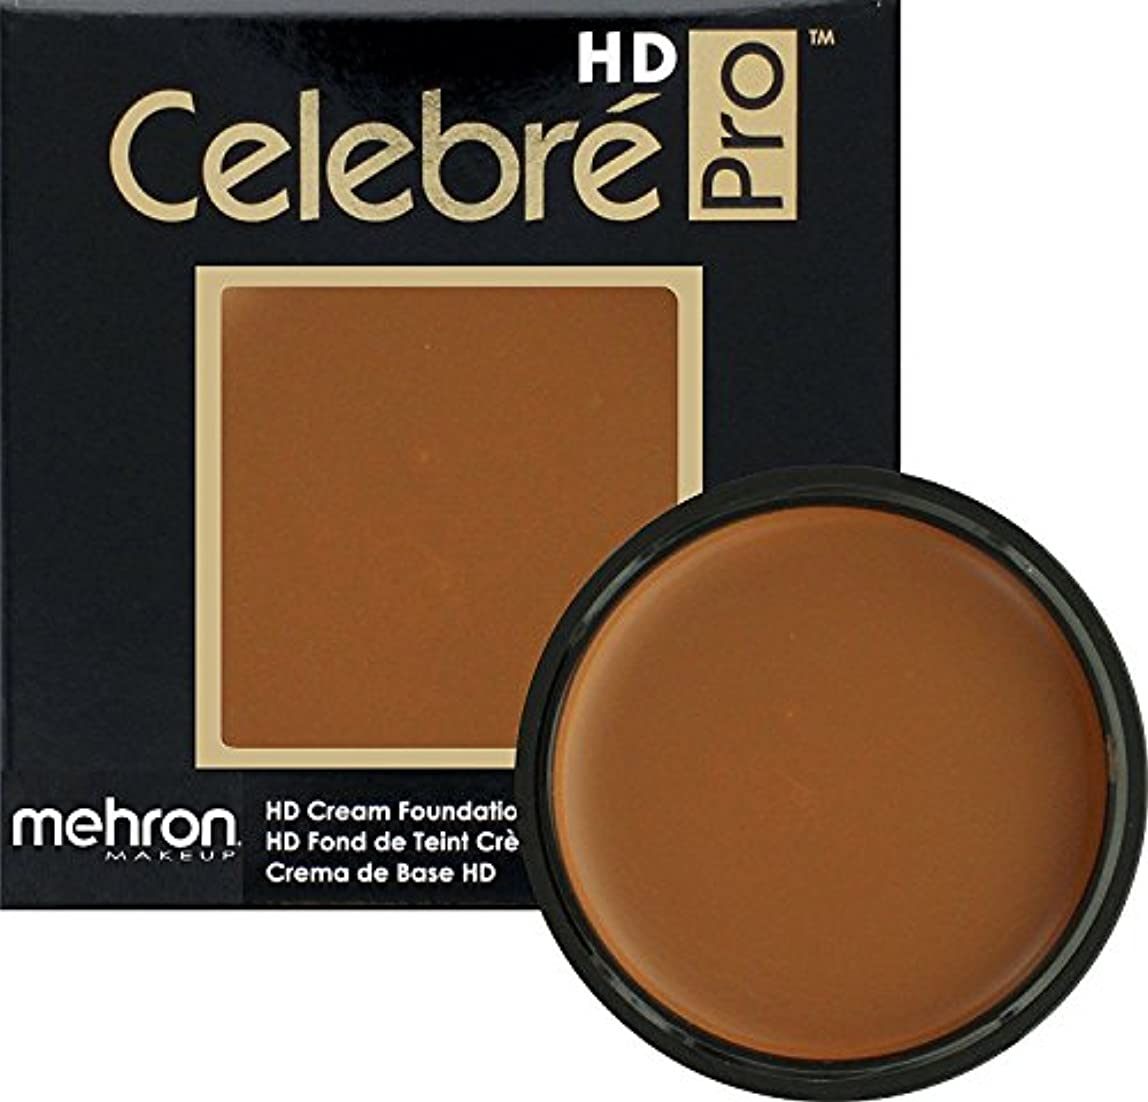 発動機マンモス社会科mehron Celebre Pro HD Make Up Medium/Dark 4 (並行輸入品)